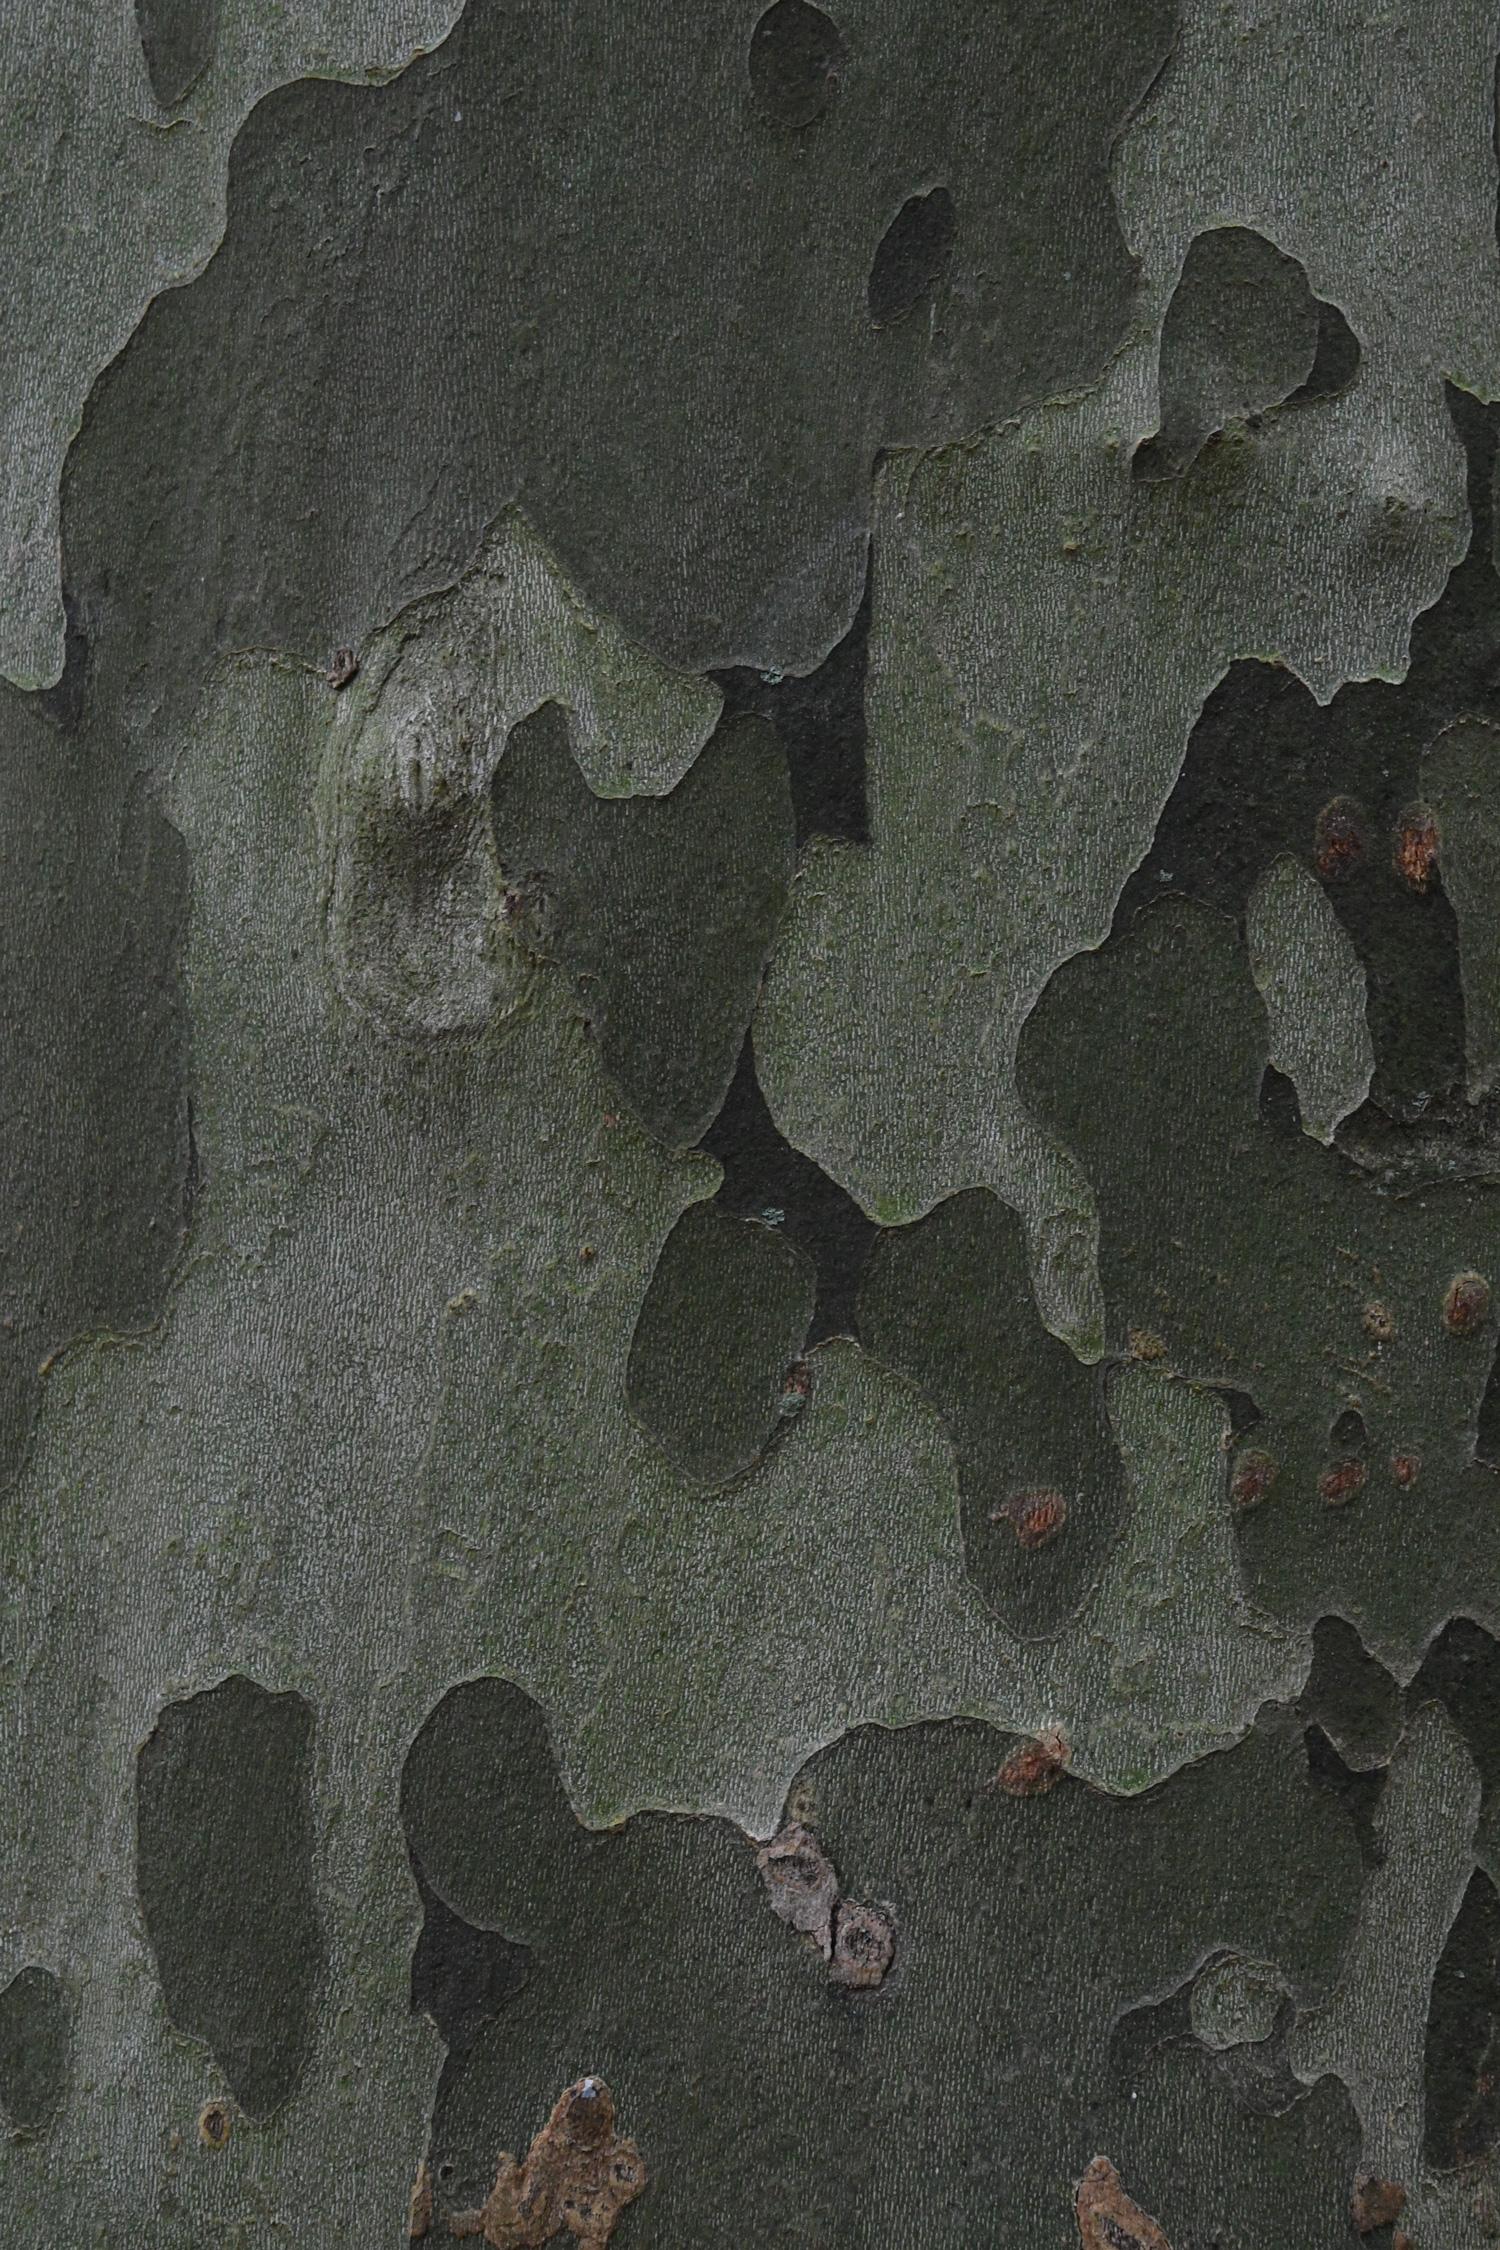 Sycamore bark, Prospect Park